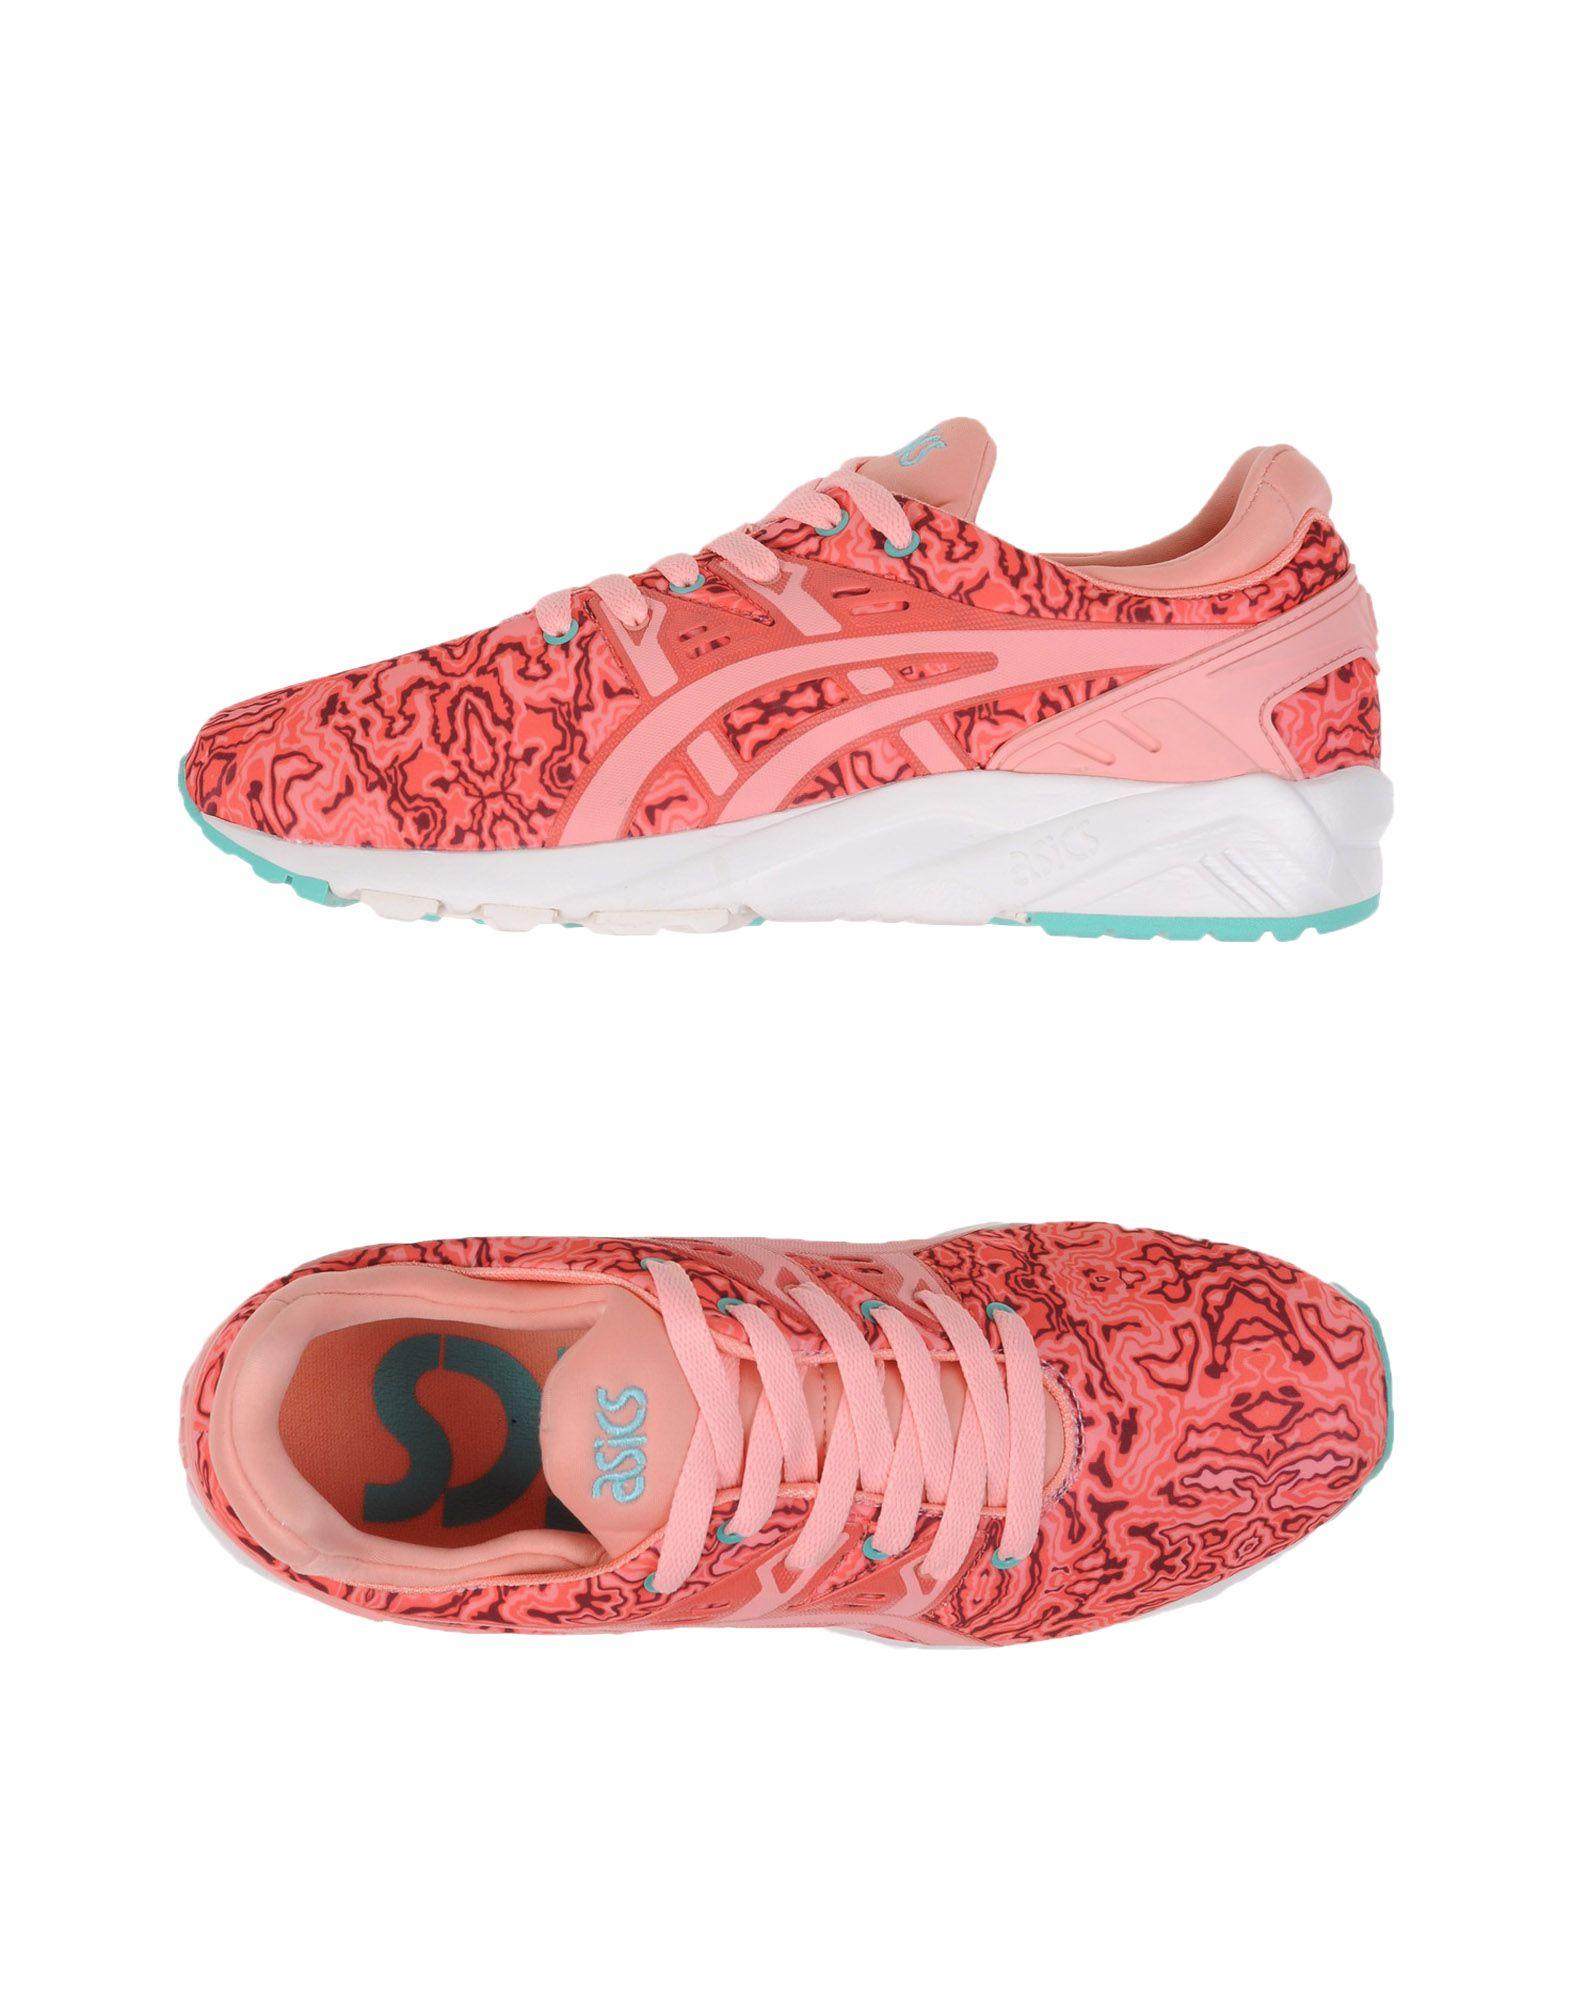 Sneakers Asics Gel-Kayano Trainer Evo - Femme - Sneakers Asics sur